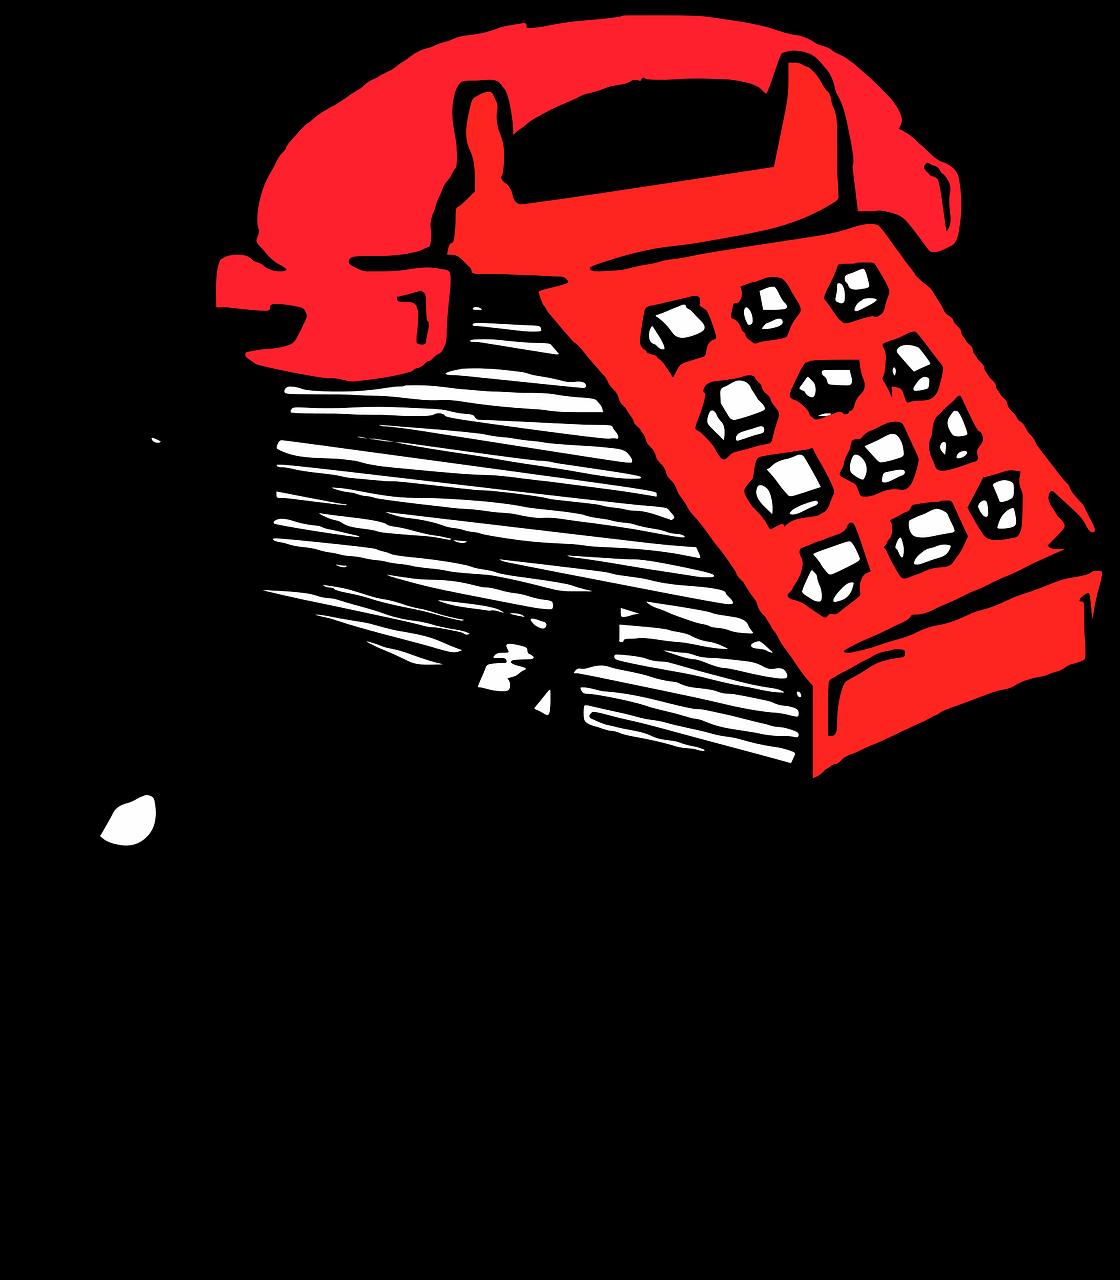 phone-1900558818-hotline-agribank